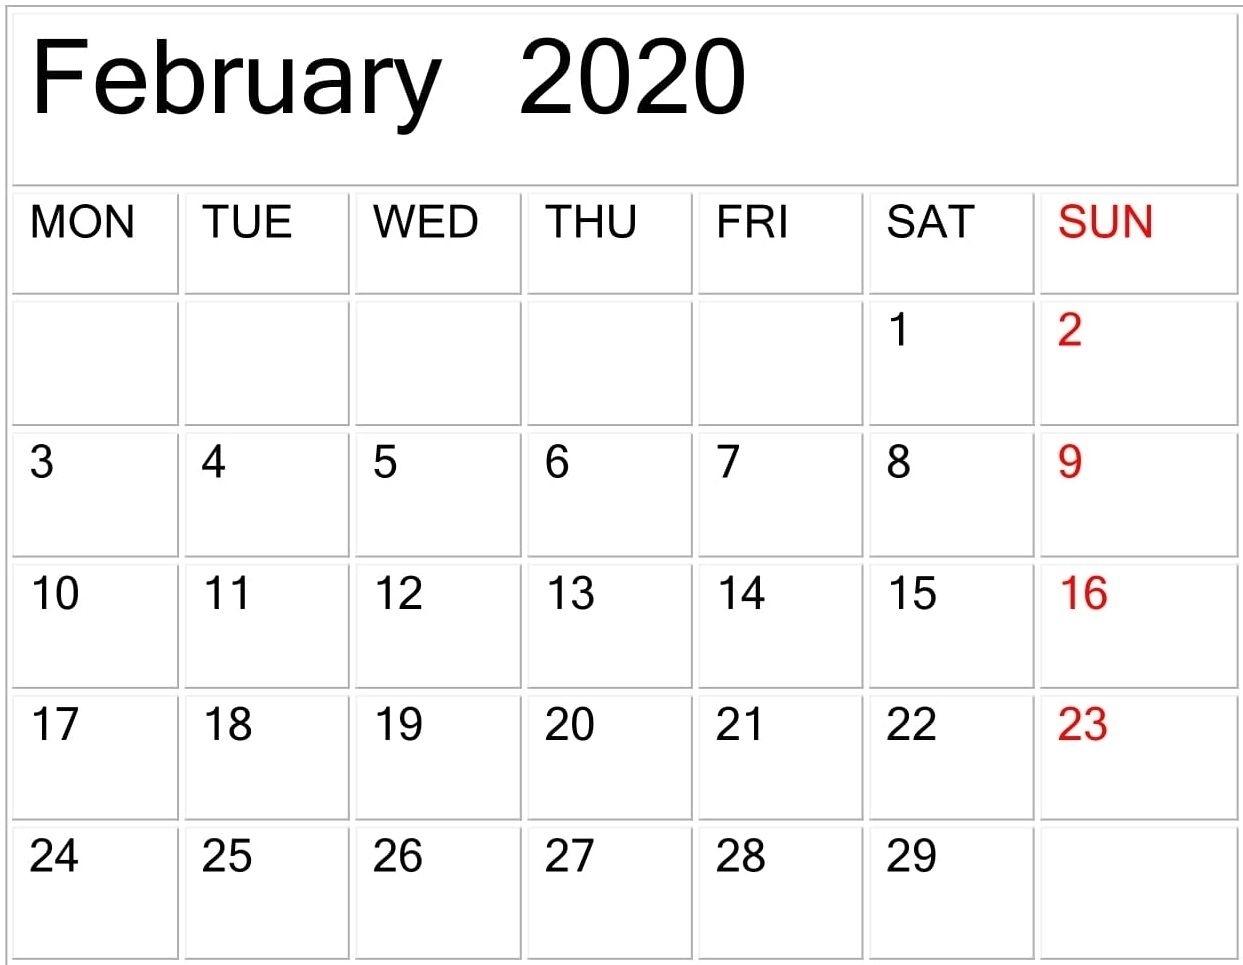 Free Printable Calendar Large Print In 2020 | Printable with regard to Large Numbers Free Printable Calendar 2020